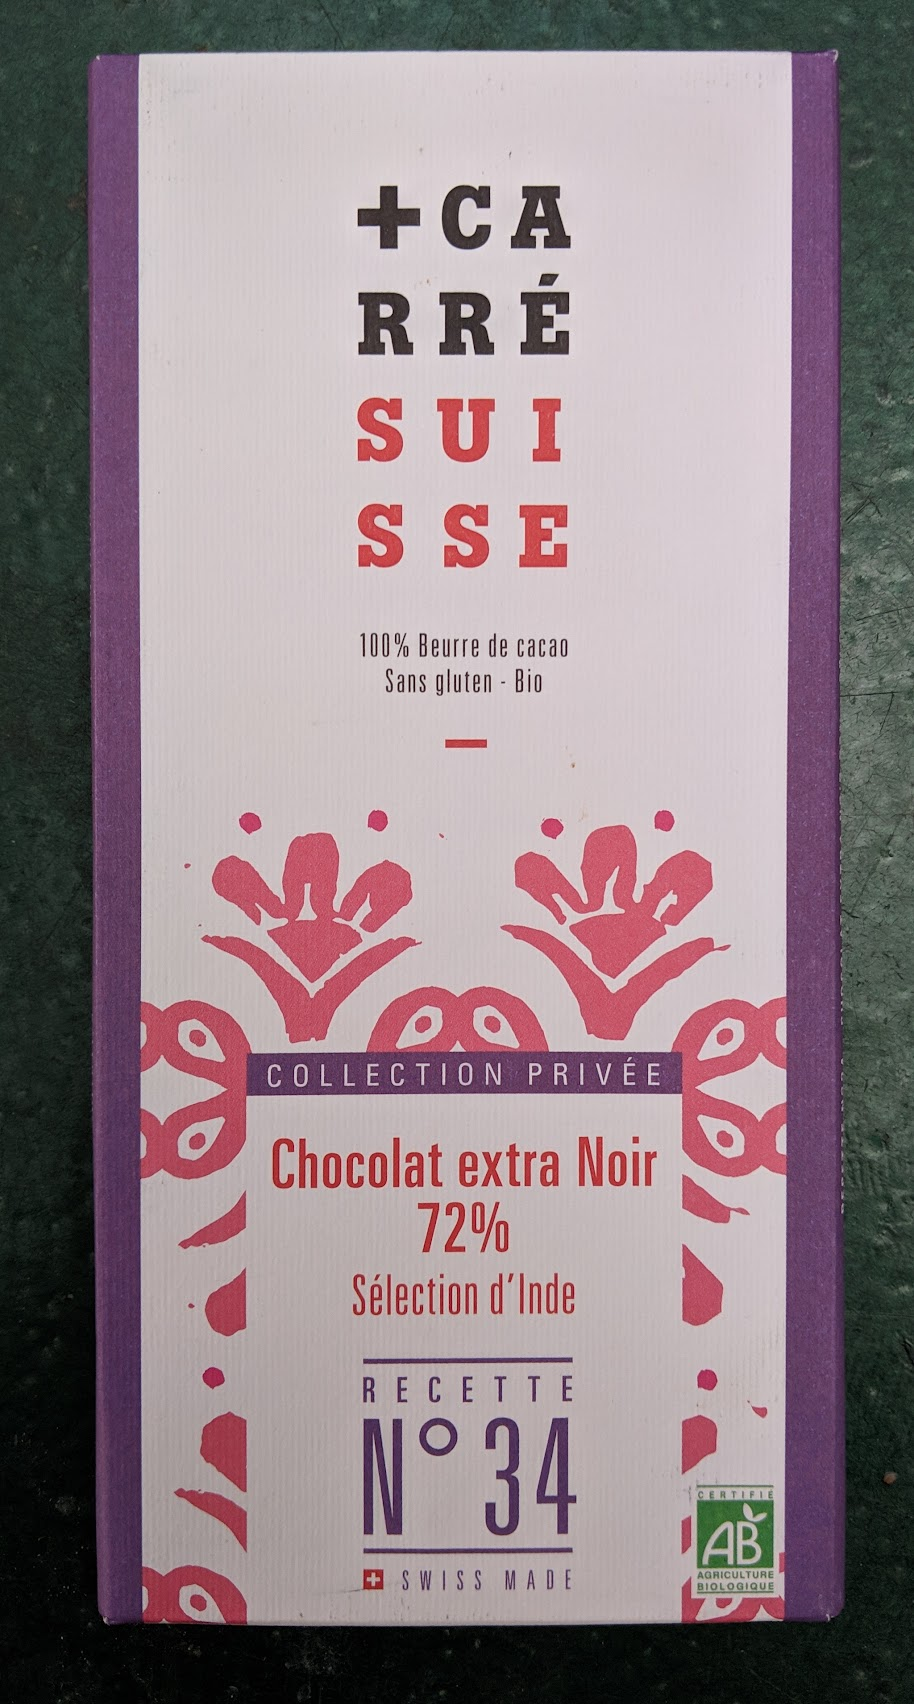 72% carre suisse bar